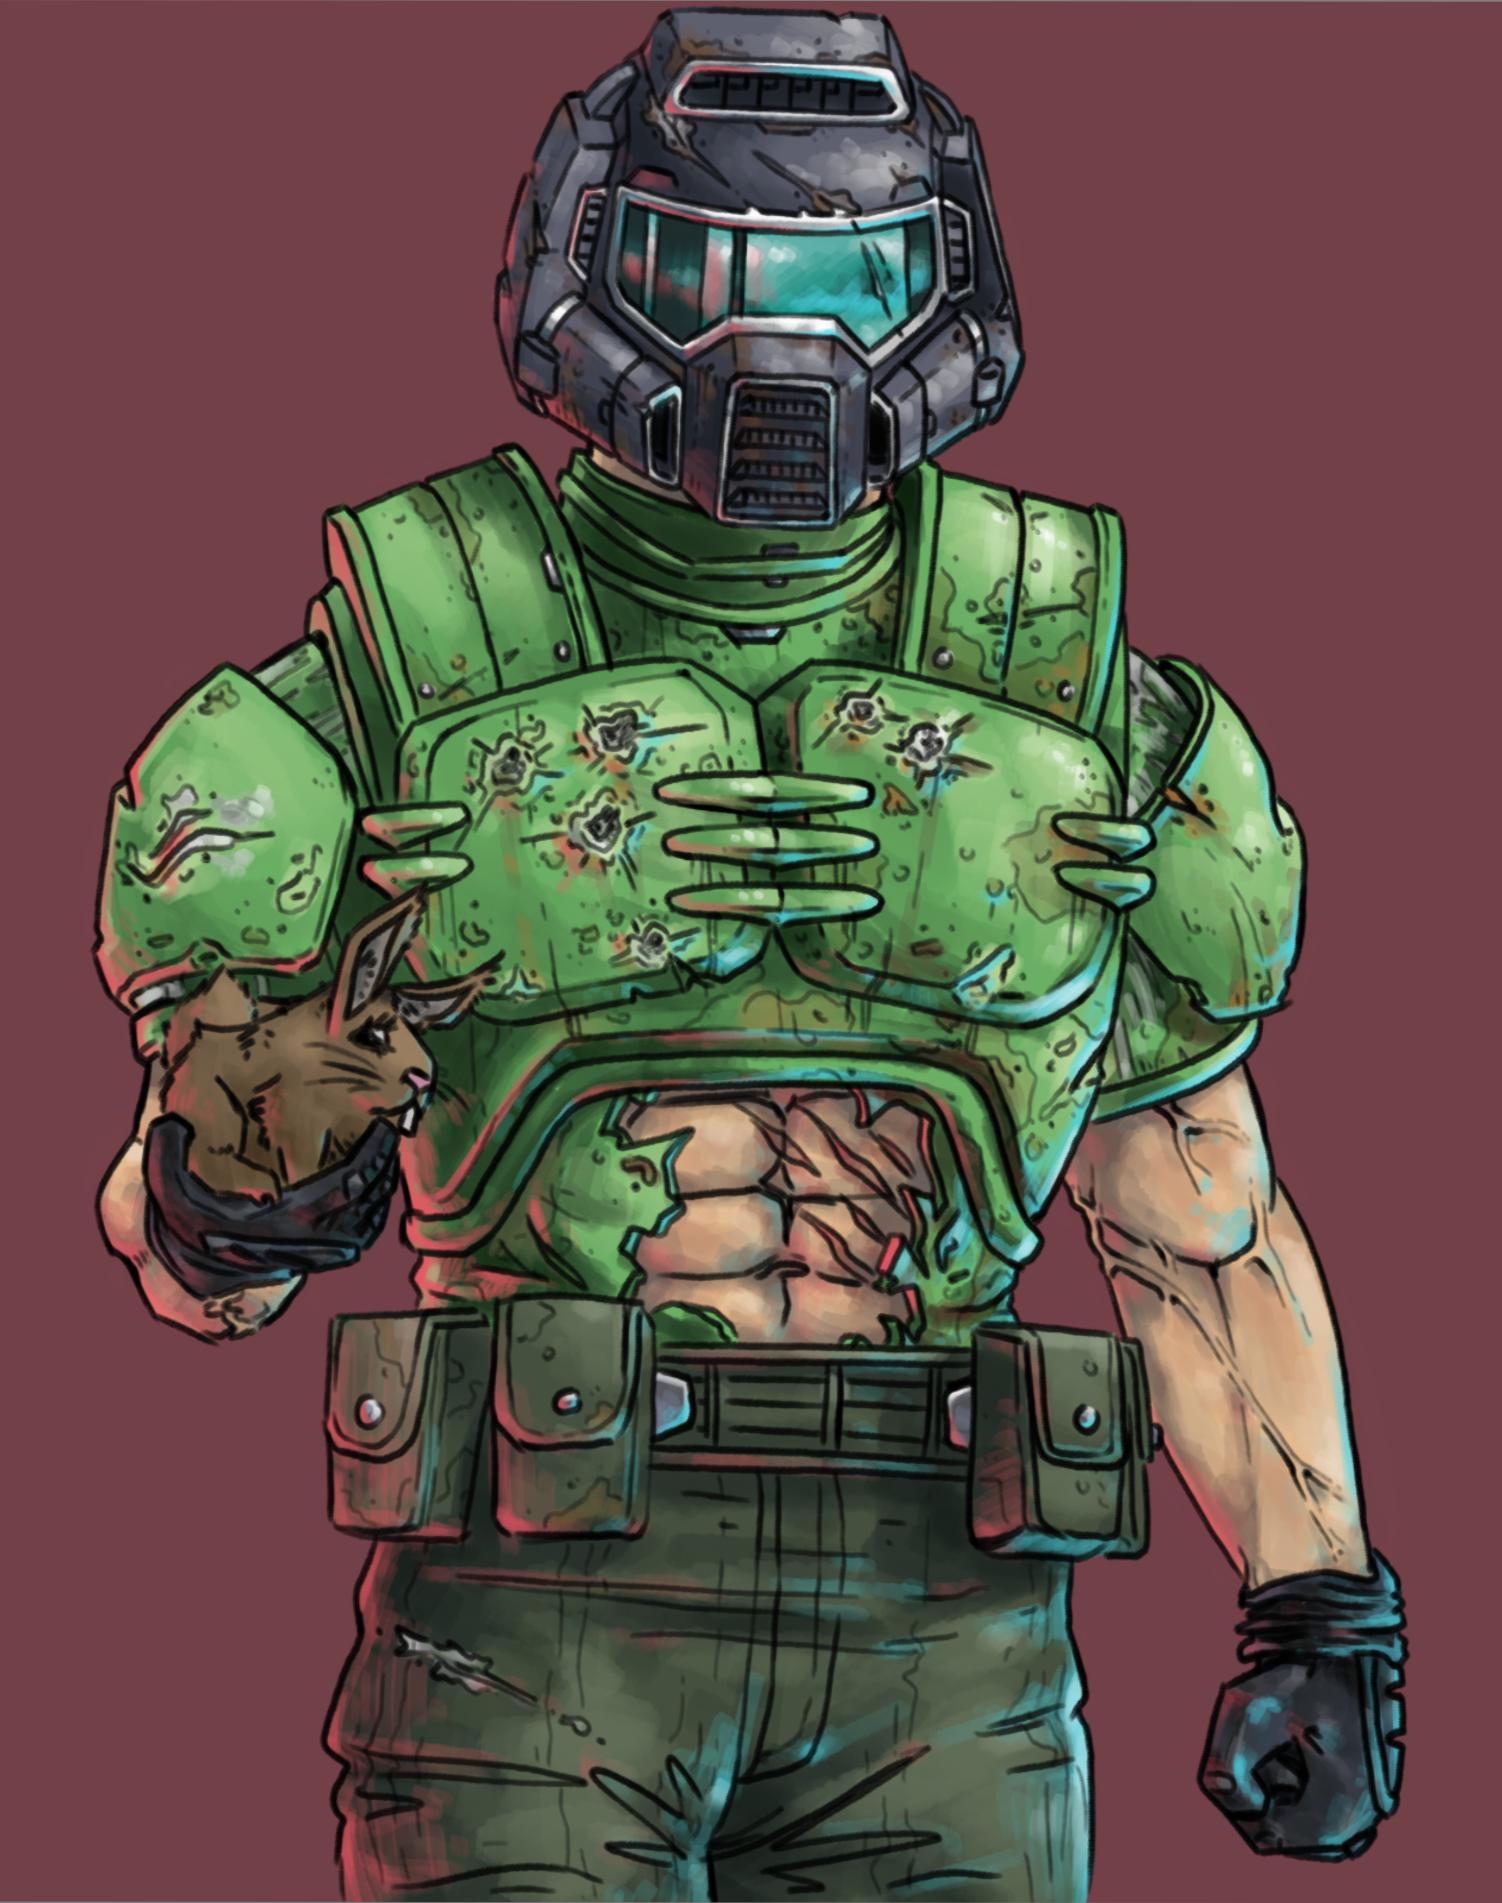 Doomguy And Daisy Fan Art Doom Videogame Slayer Meme Fallout Concept Art